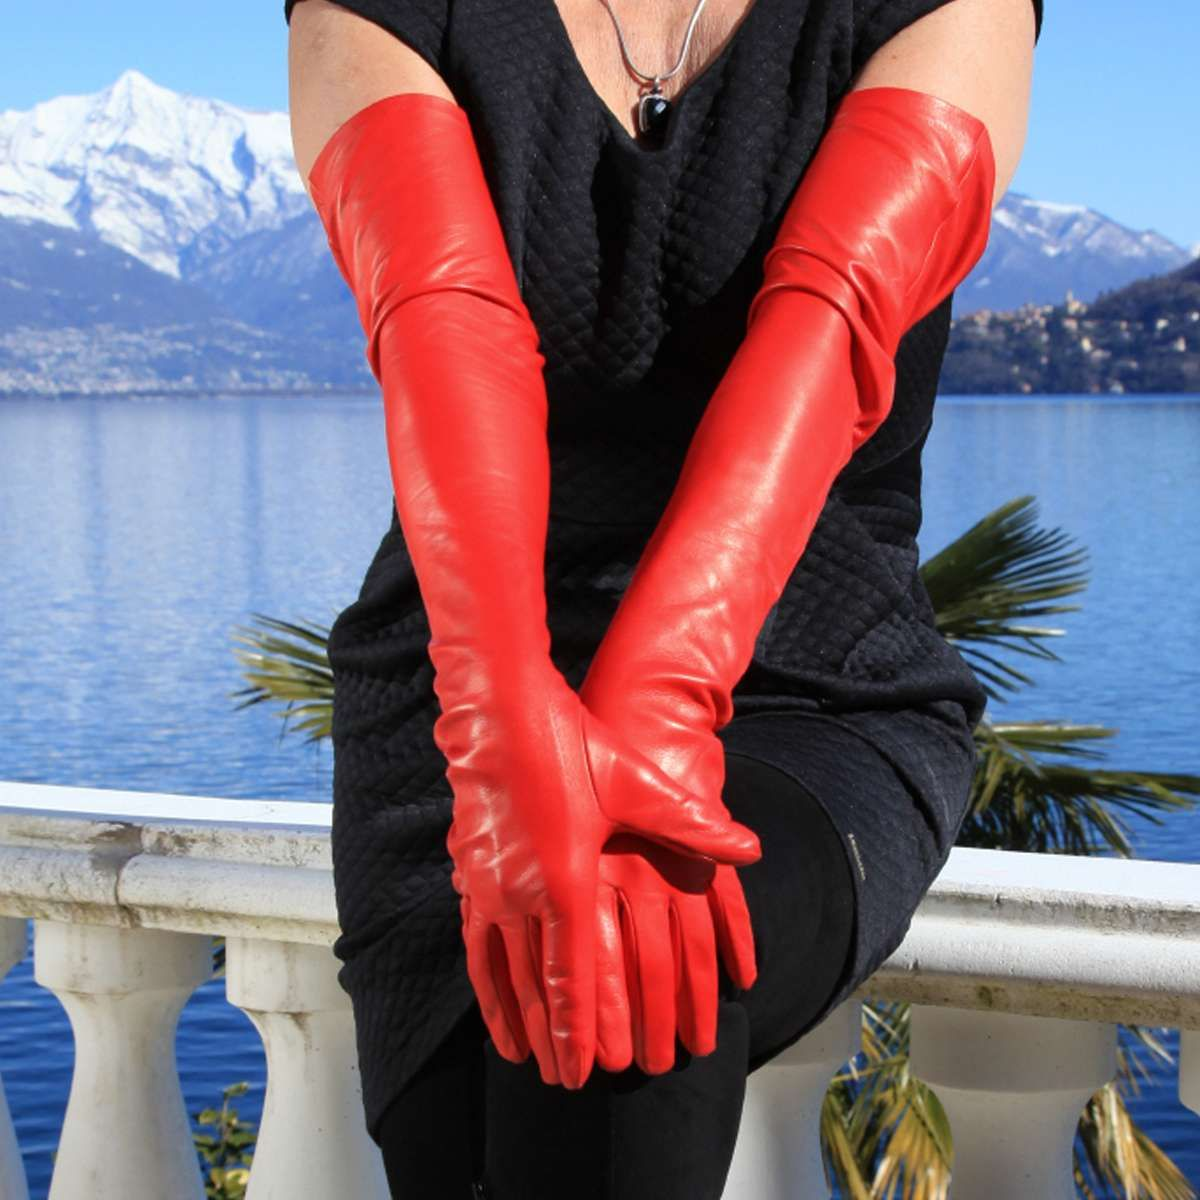 c06dc84f839c19 Schulterlange rote Lederhandschuhe - MICELI Gloves